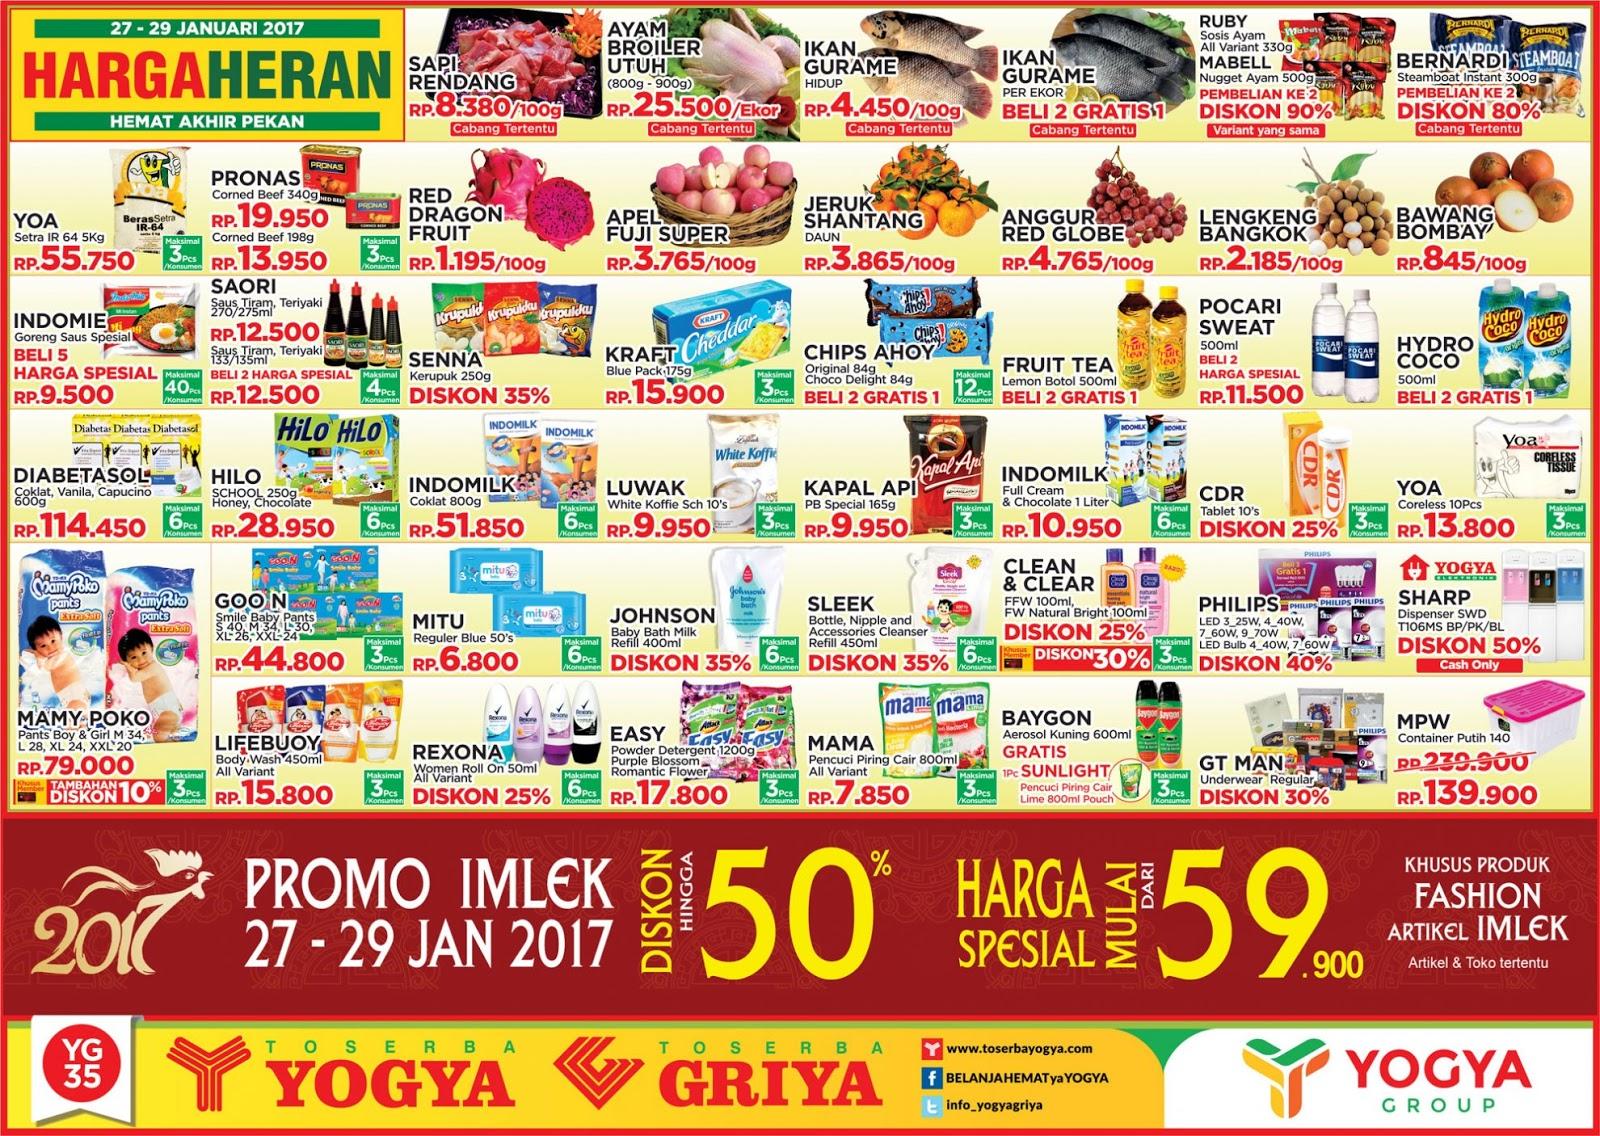 Info Dan Berita Teknologi Terbaru Promo Jsm Toserba Yogya Terbaru 2017